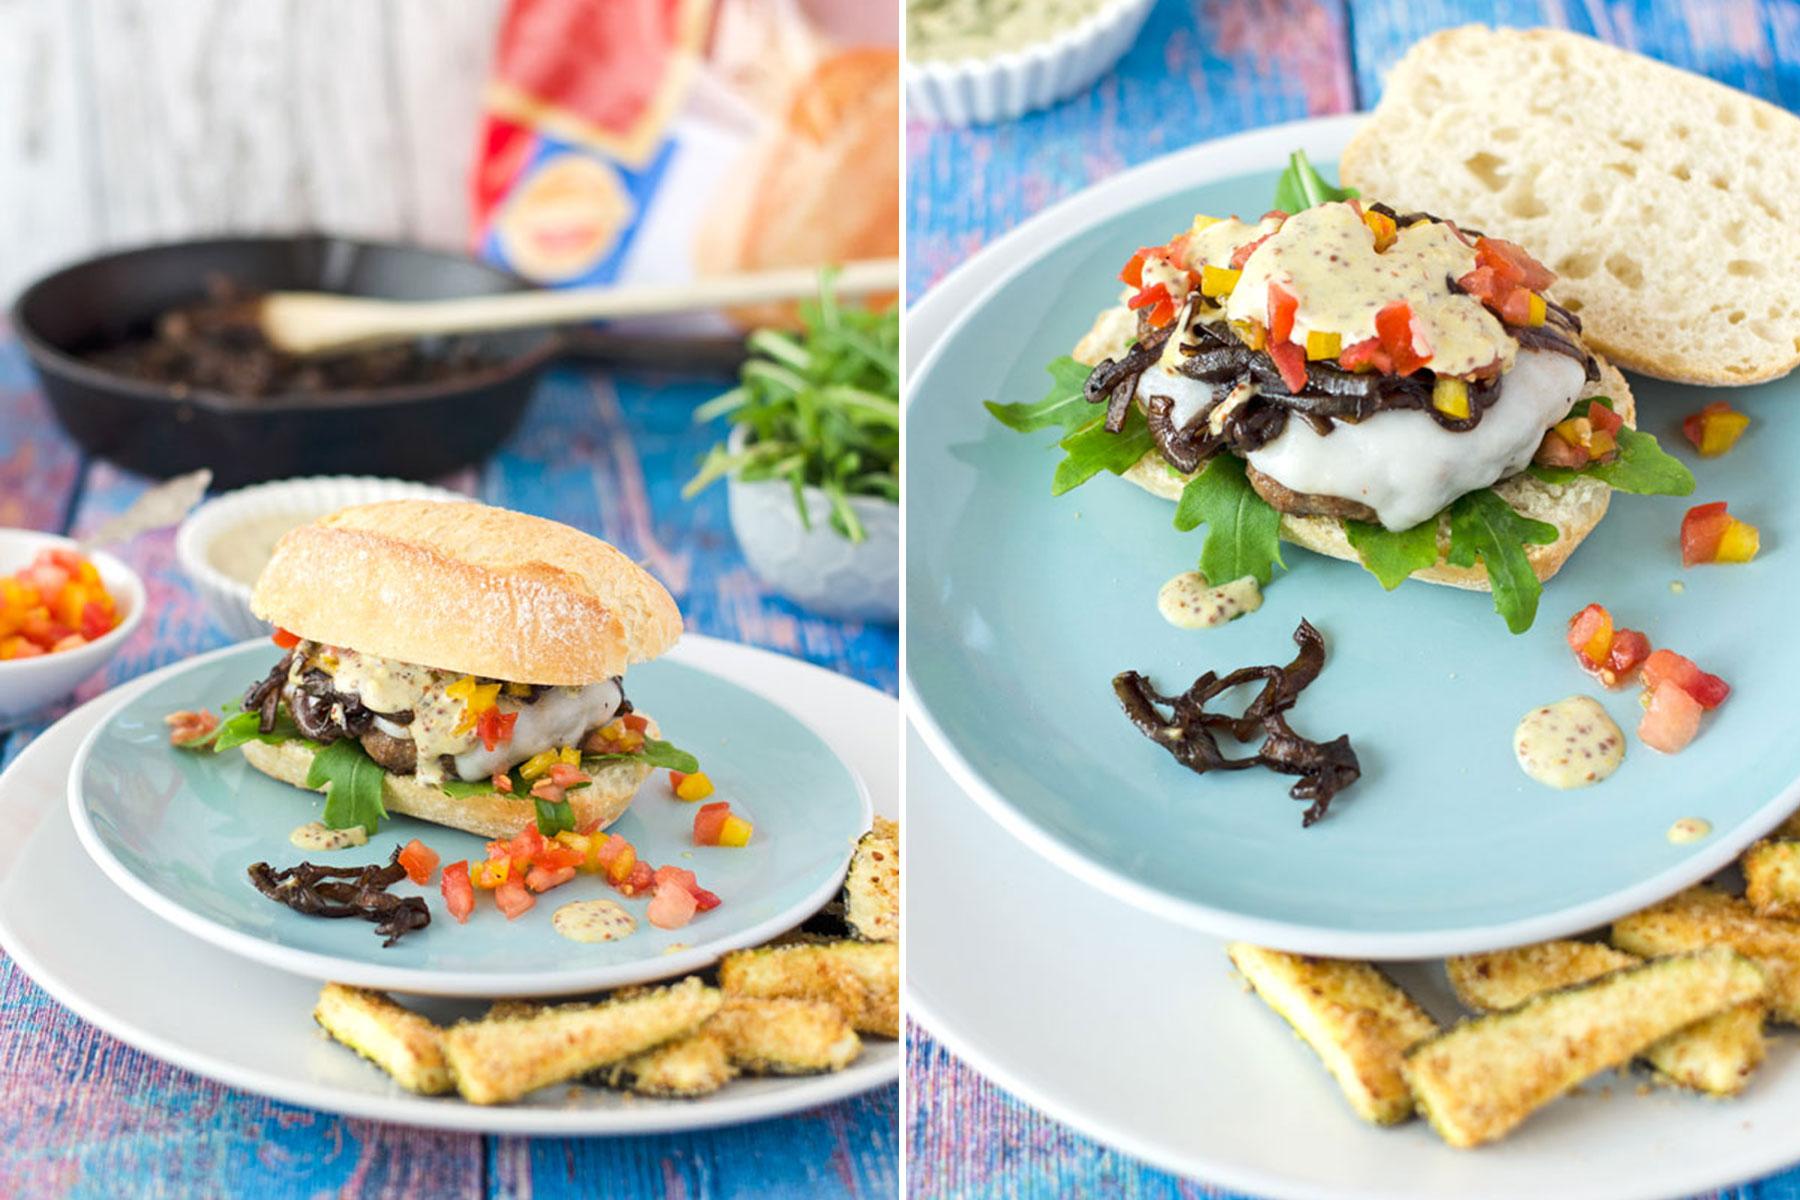 BURGER-MANIA: Lamm Burger mit Estragon-Senfsauce